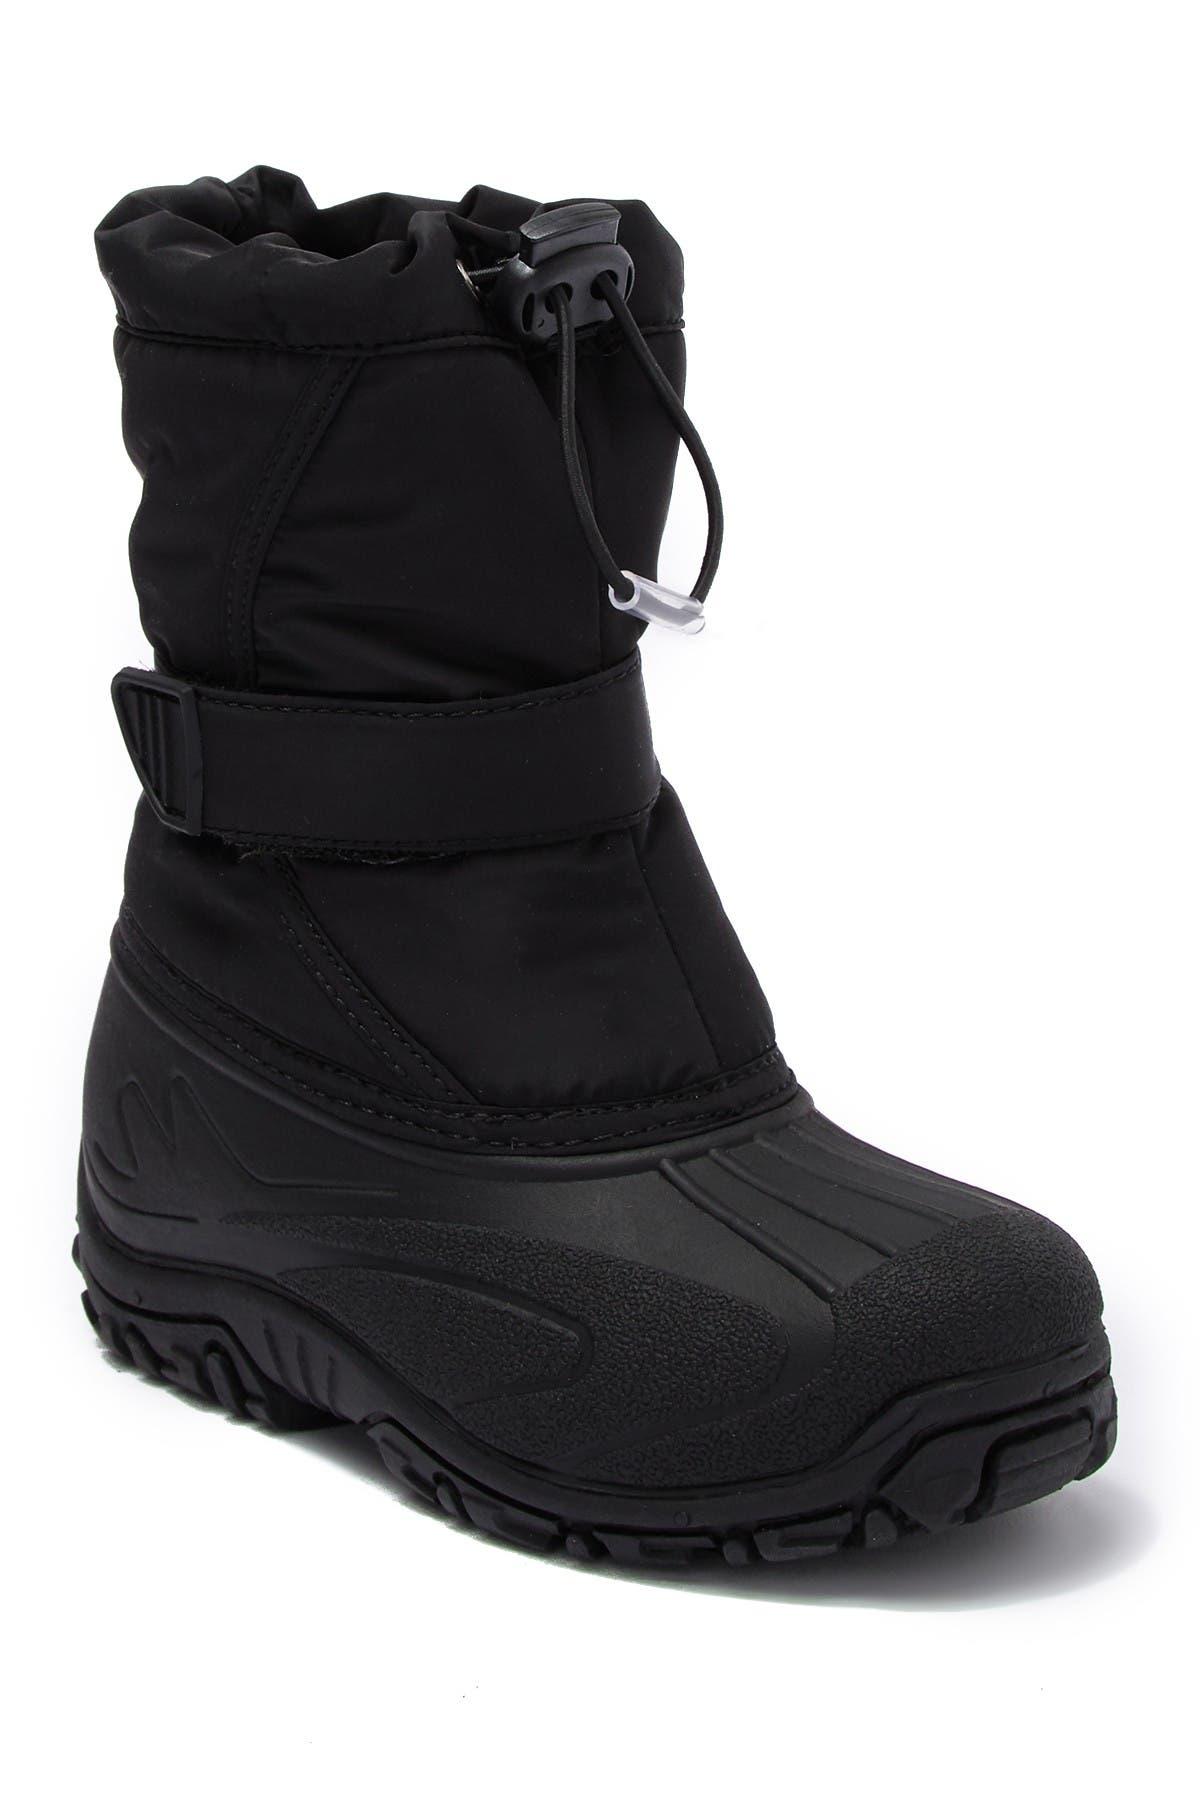 Image of Harper Canyon Winter Waterproof Boot (Baby & Toddler)